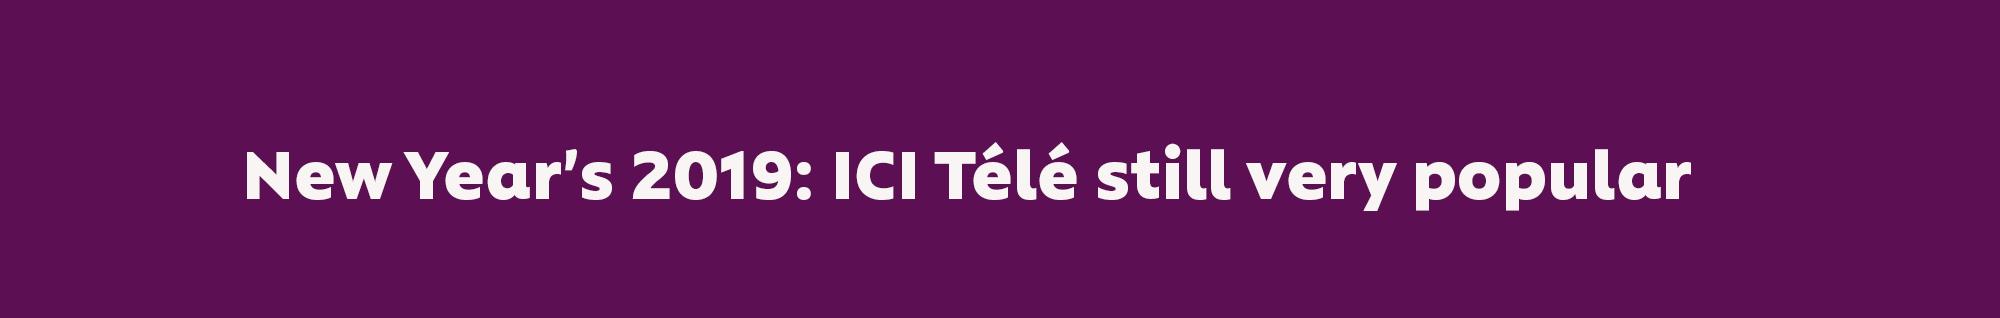 New Year's 2019: ICI Télé still very popular